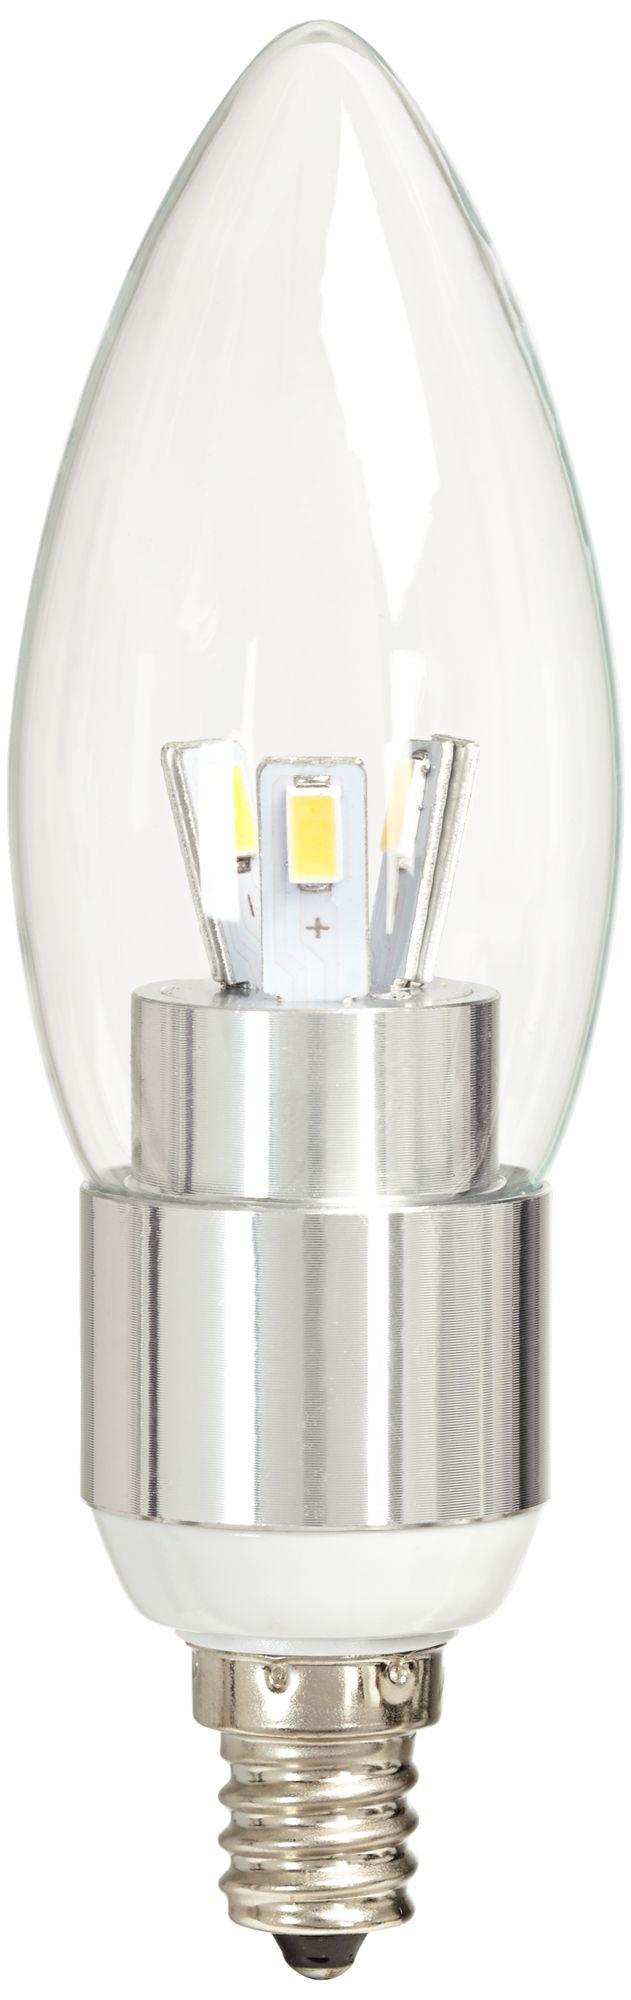 40w equivalent clear 5w led 12 volt candelabra bulb